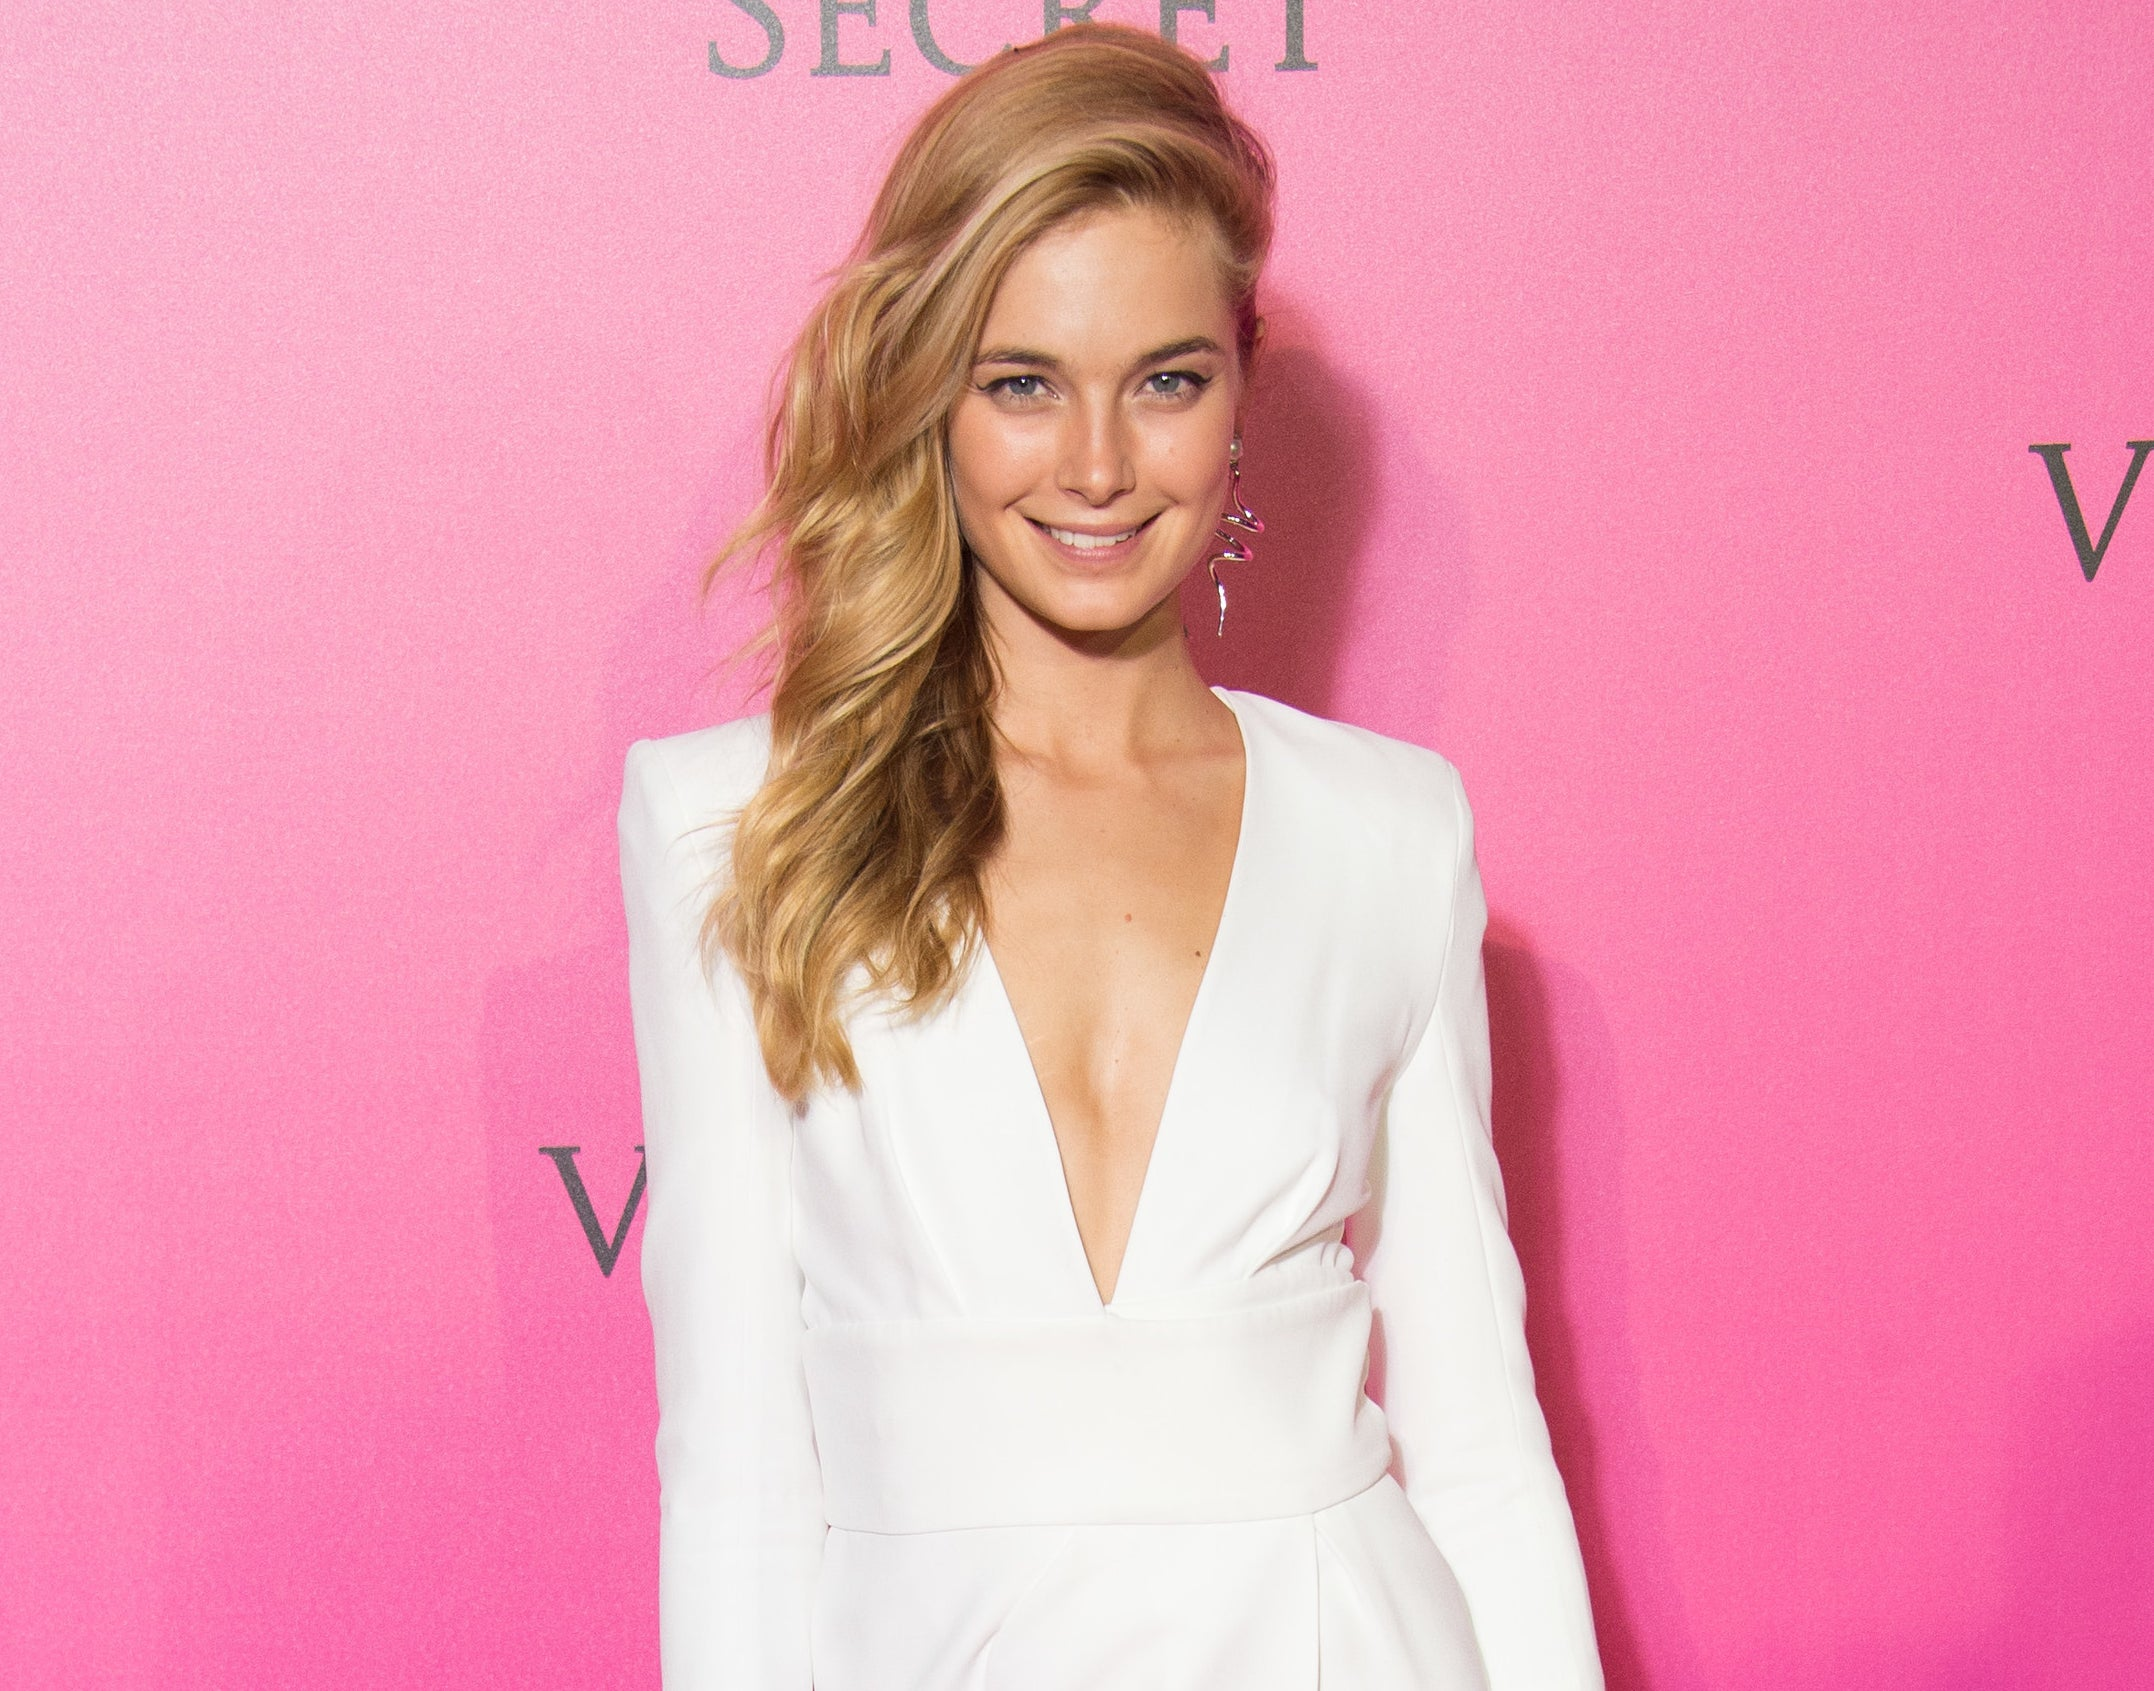 Bridget attends a Victoria's Secret red carpet event